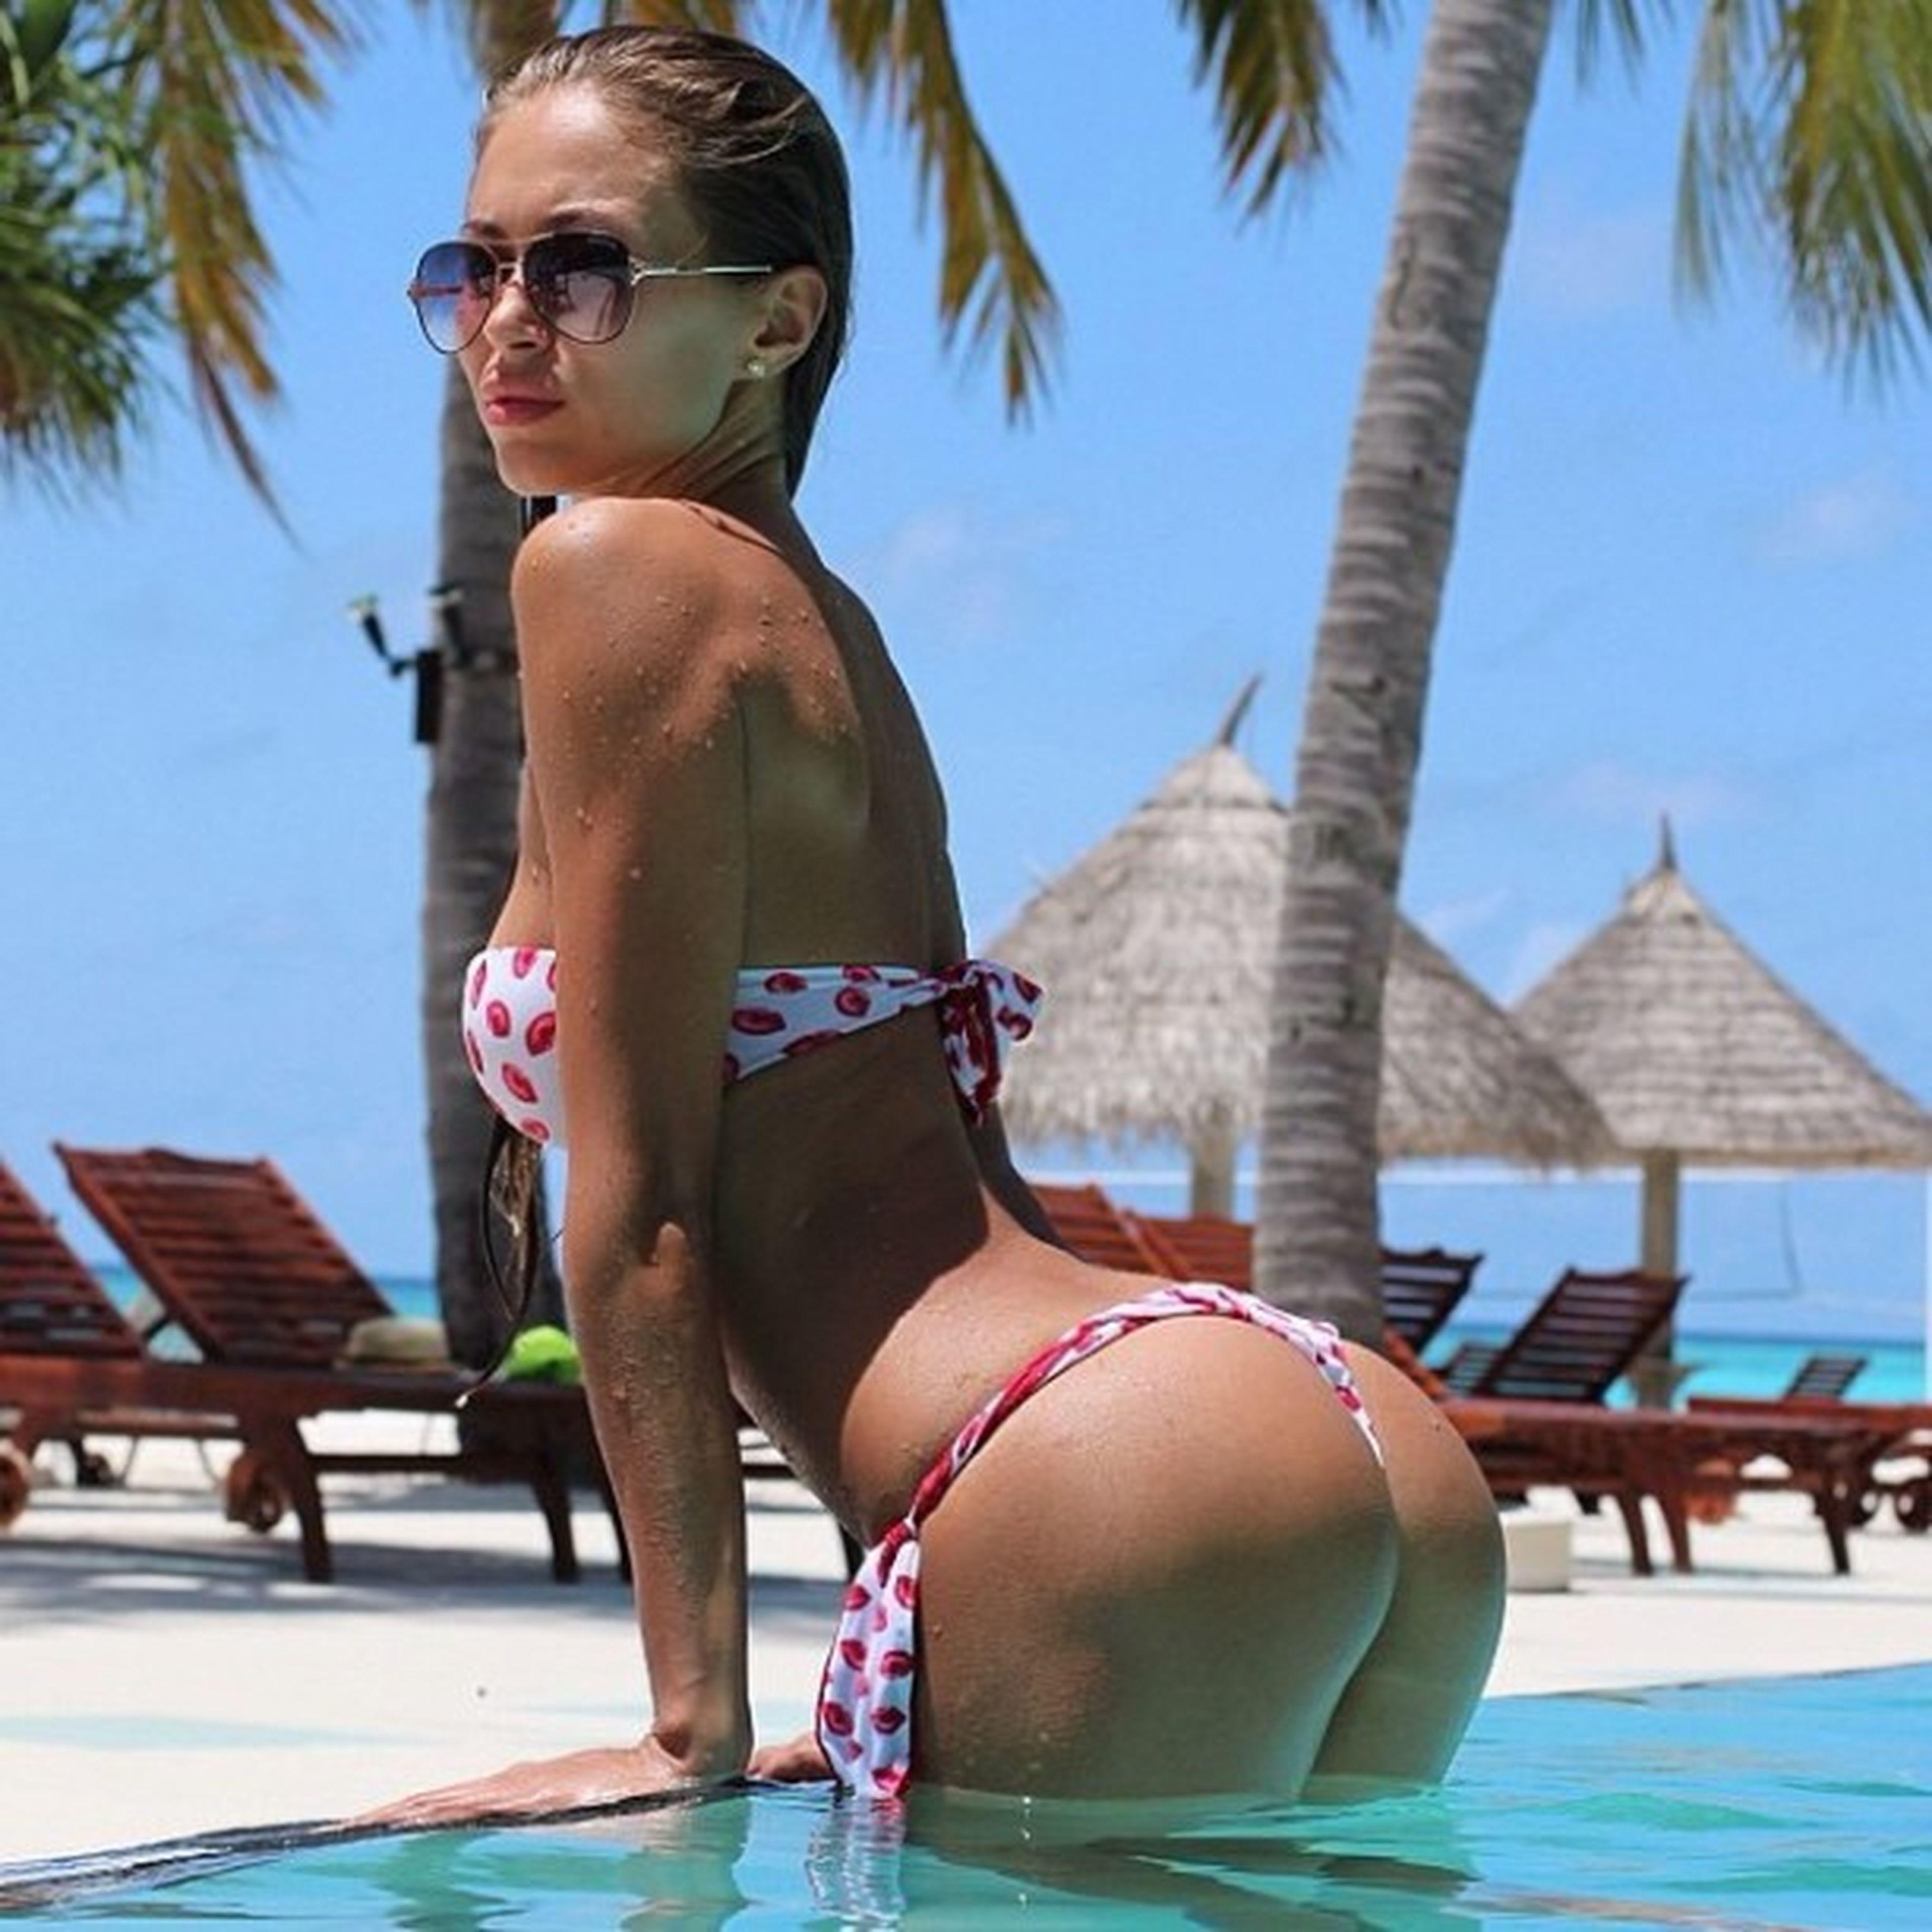 Kemer Sezon Açılısı Yapmış Russian Beach Girl Summer Club